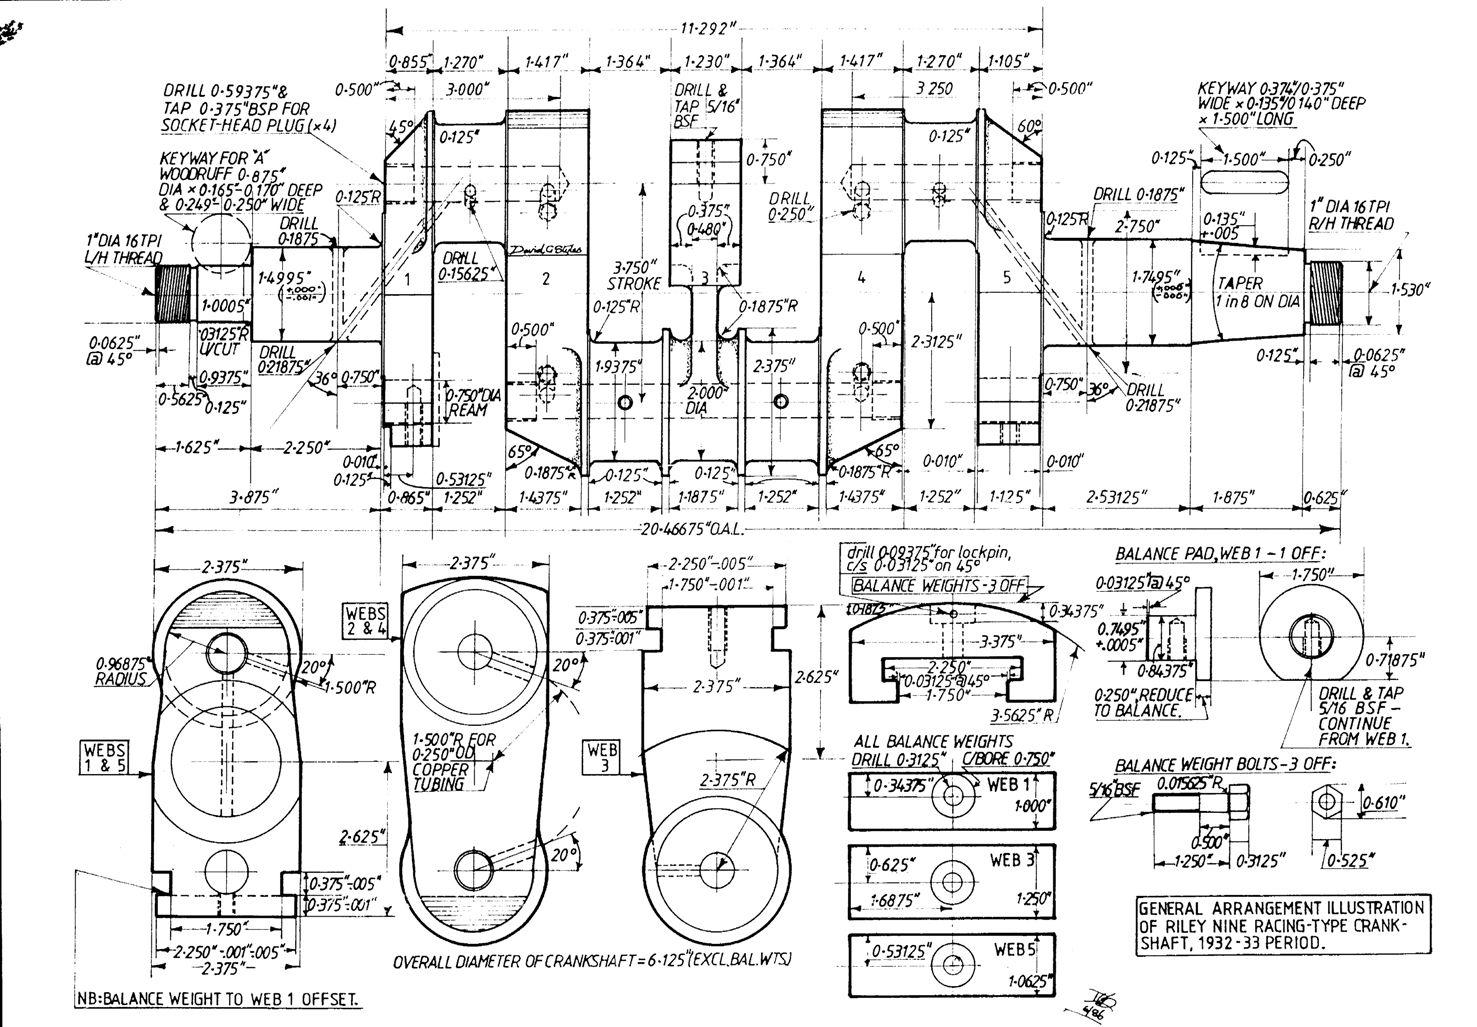 1932 33 crankshaft for racing riley nine engine  [ 1477 x 1027 Pixel ]